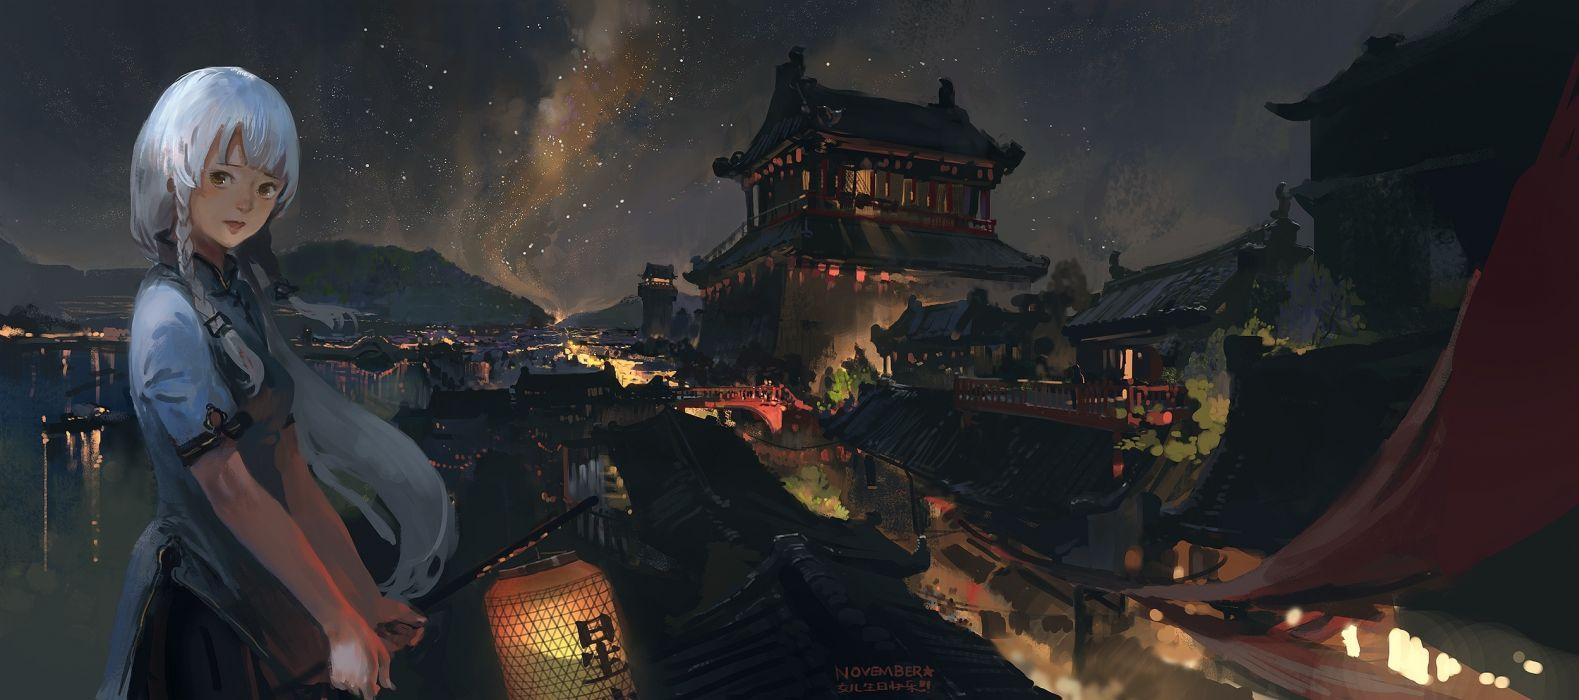 Stardust Xingchen Vocaloid Braid Anime Landscape Buildings Traditional wallpaper